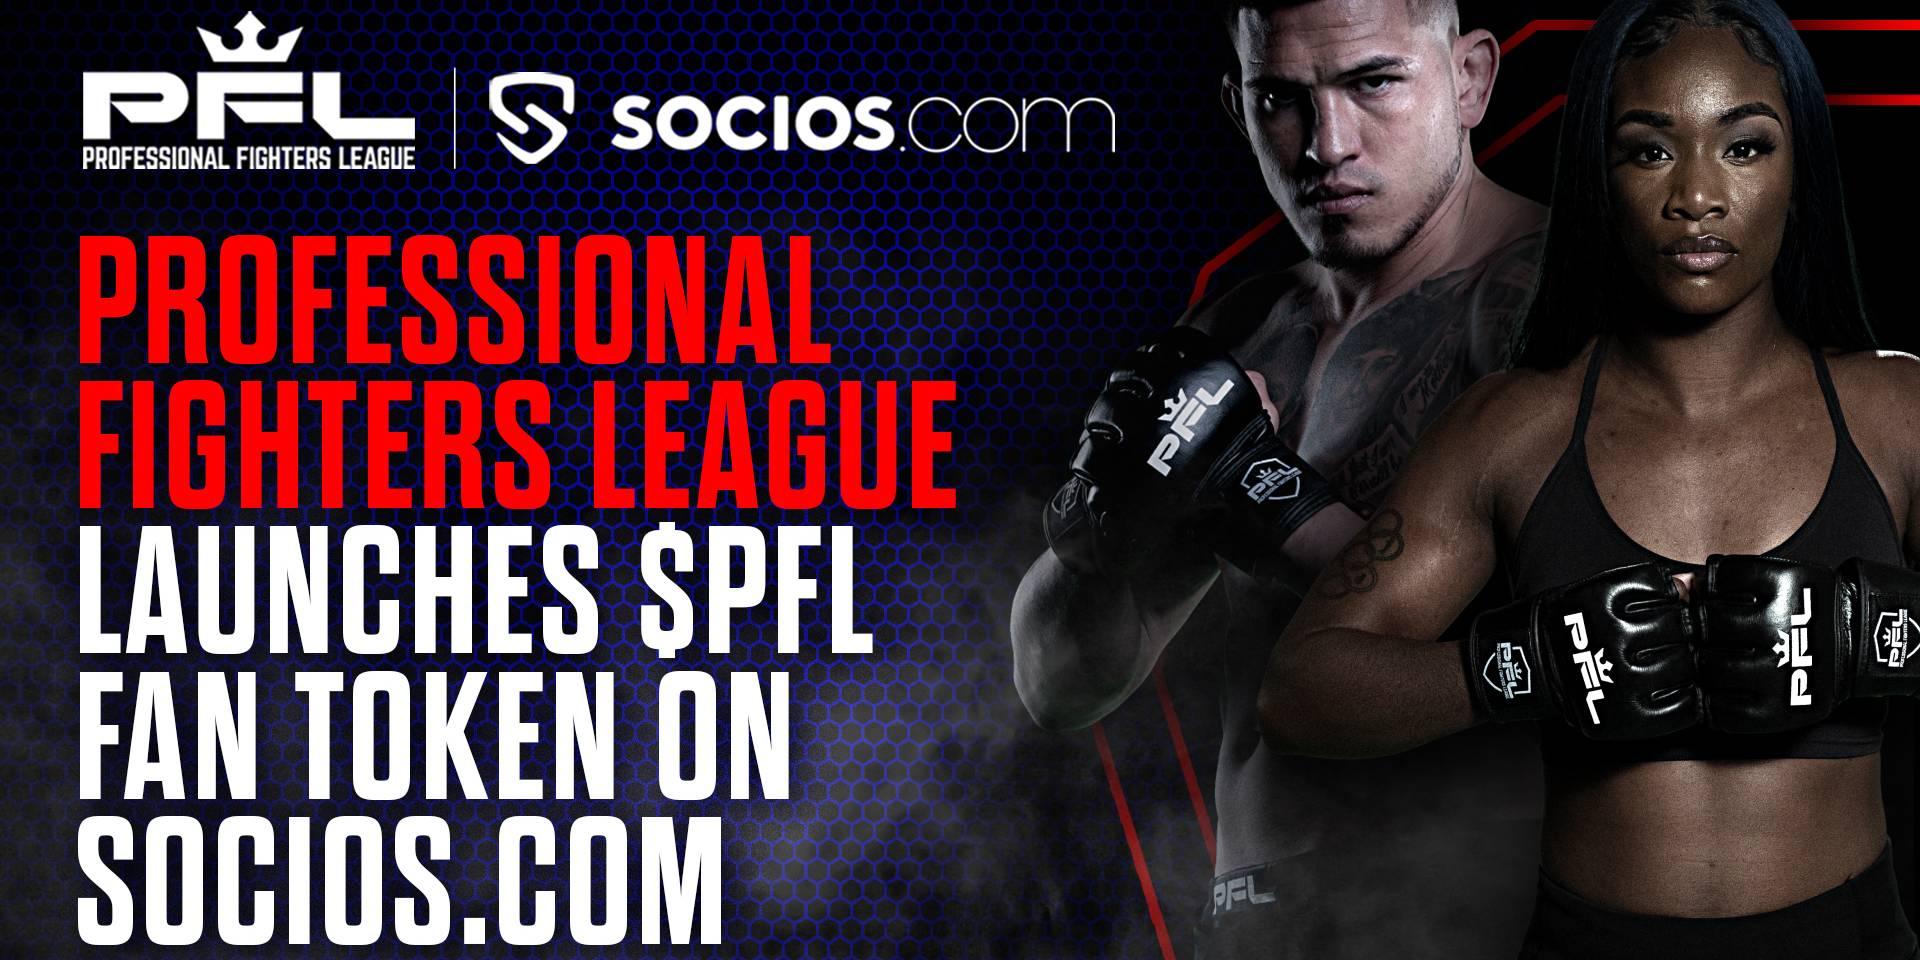 PROFESSIONAL FIGHTERS LEAGUE LAUNCH $PFL FAN TOKEN ON SOCIOS.COM